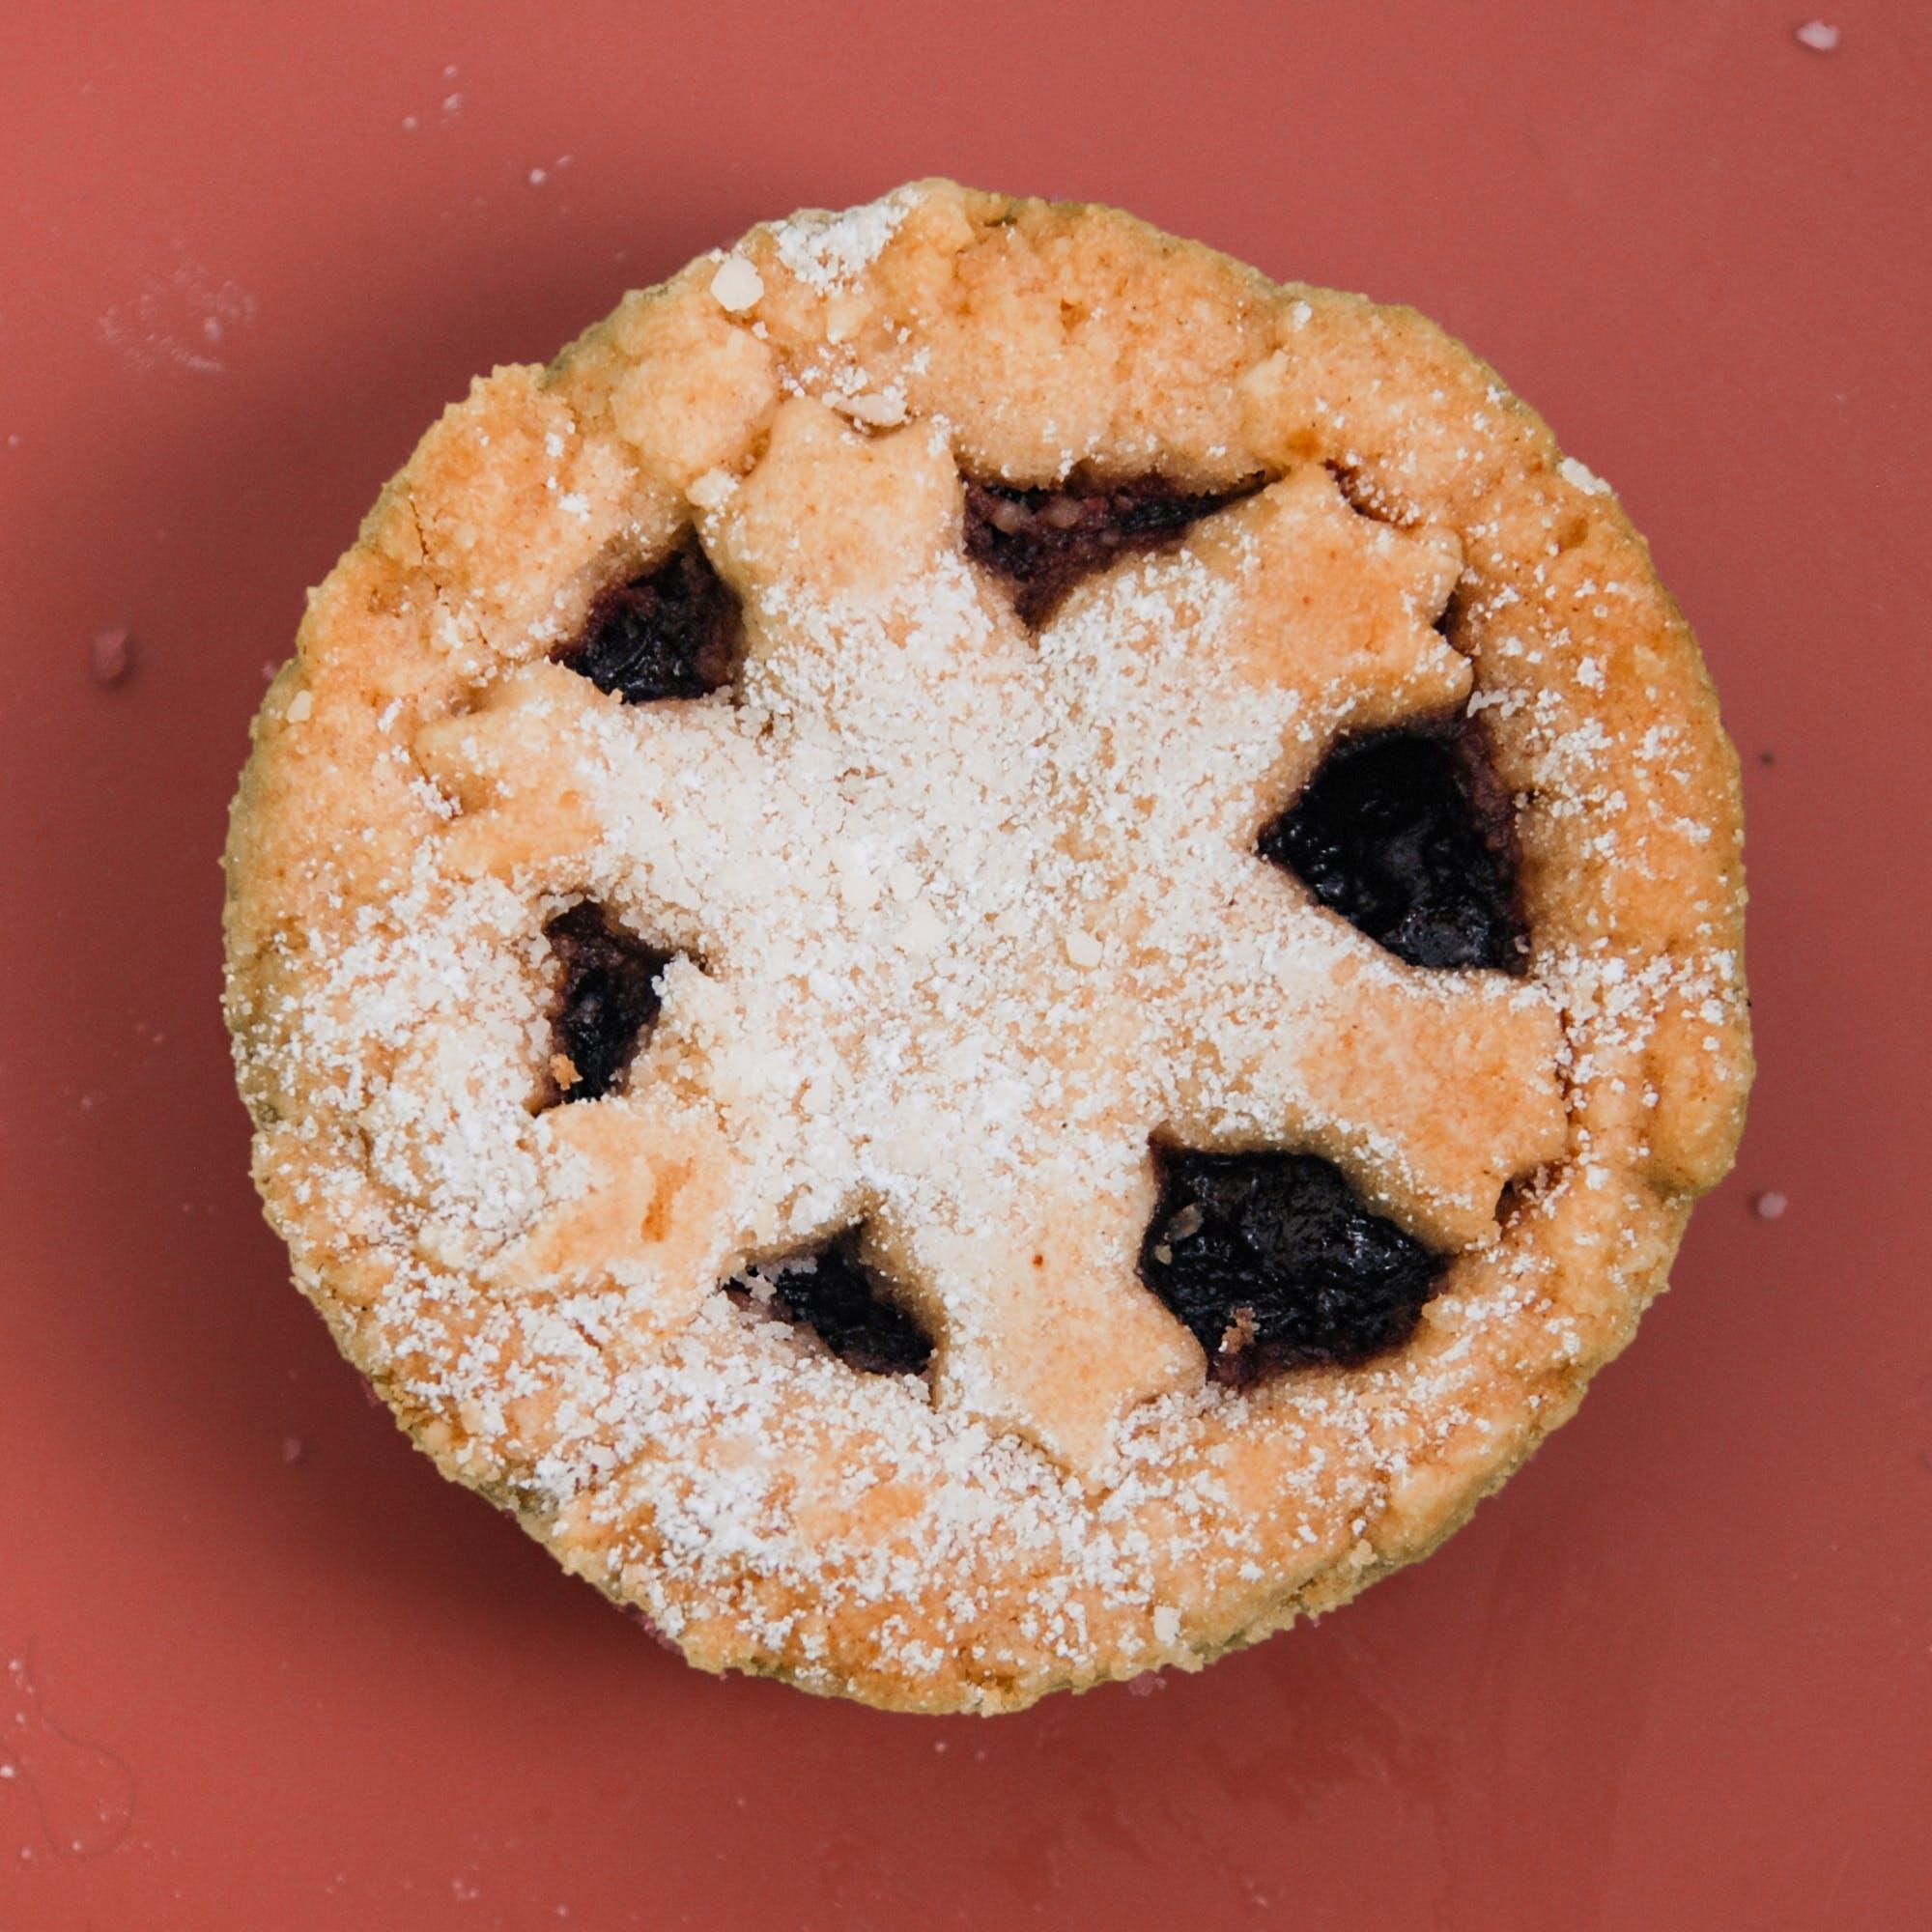 Free stock photo of bake, baked goods, cake, christmas cookies